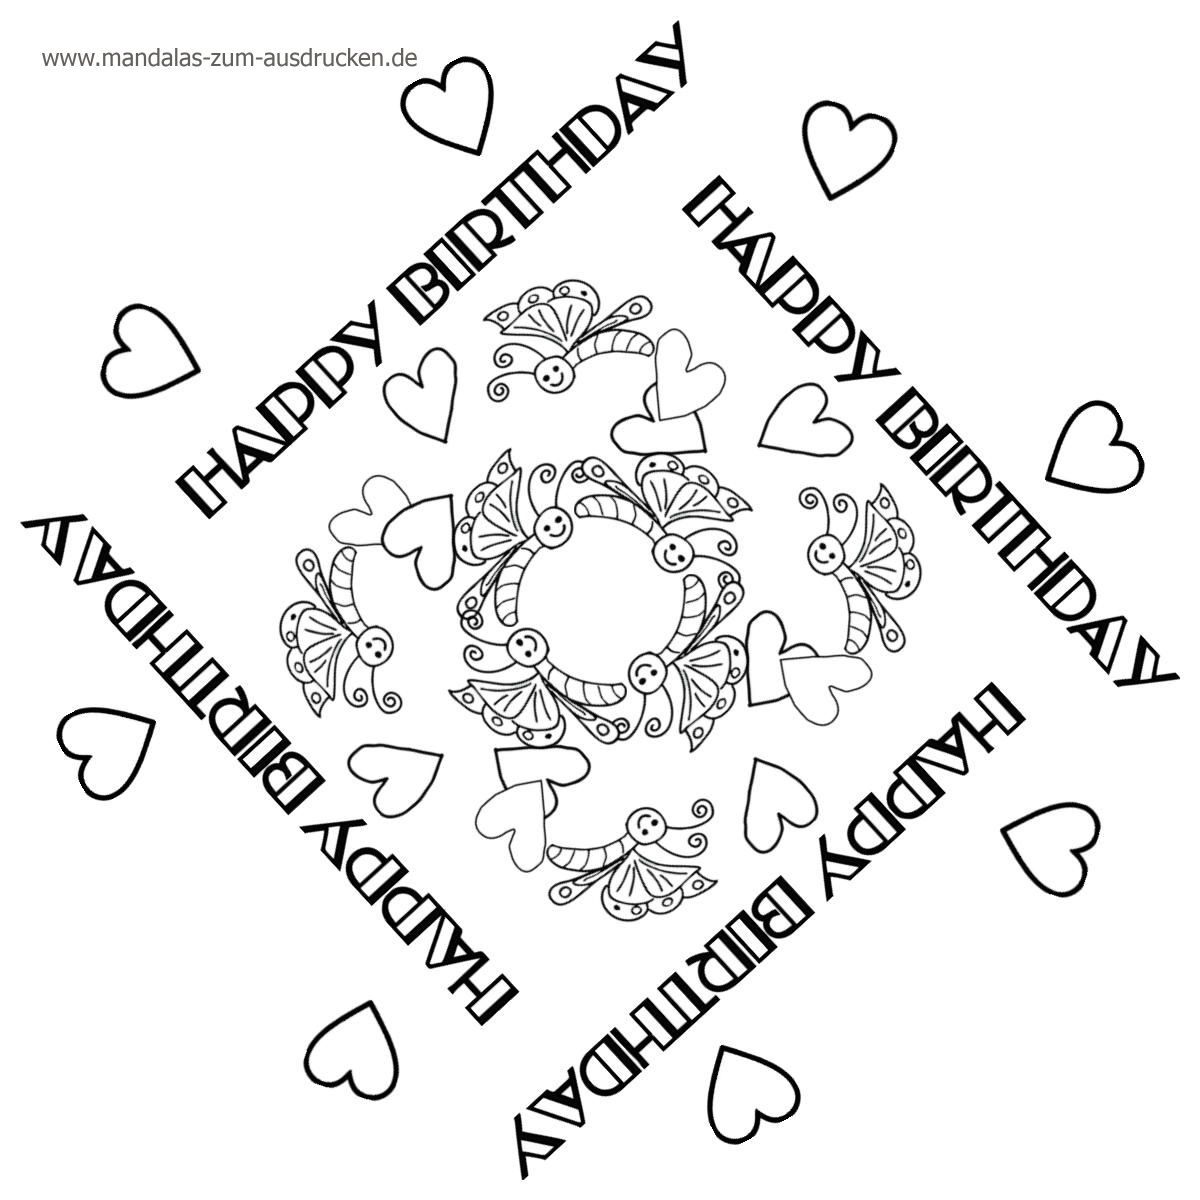 Free Mandala Vorlage Happy Birthday Zum Download | Mandalas ganzes Mandalas Geburtstag